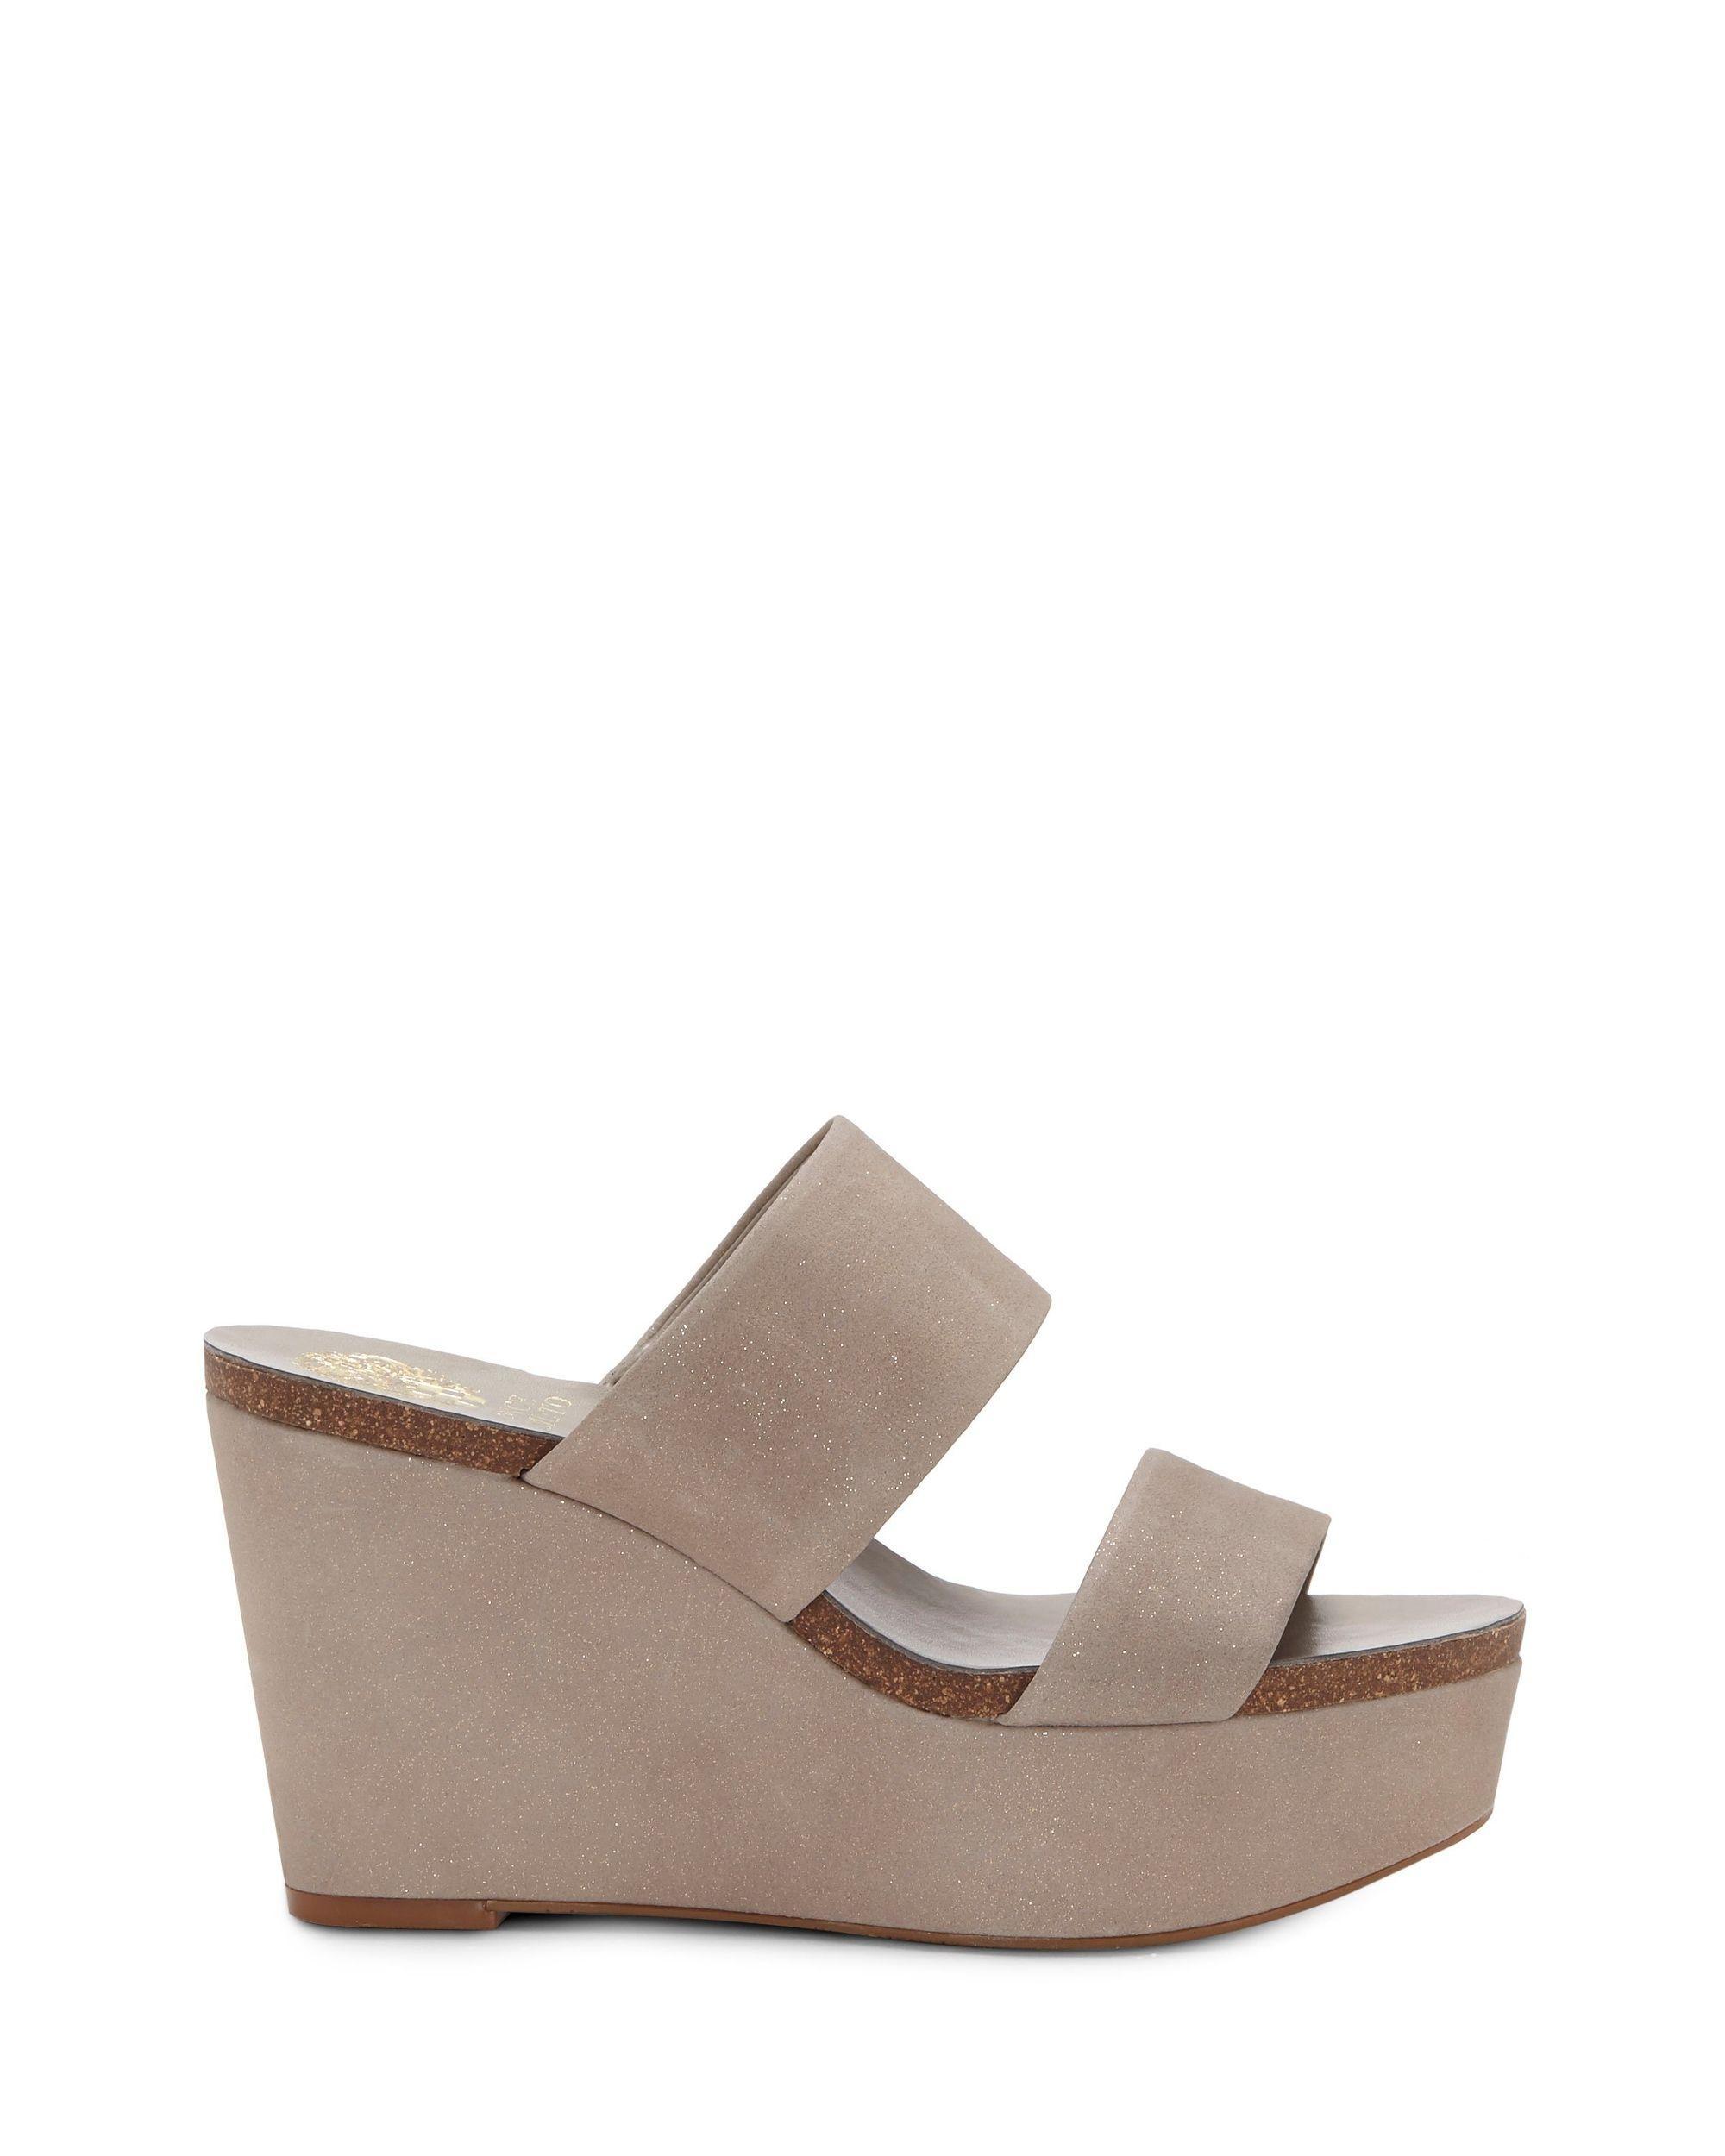 b1ec3b6ac70 Lyst - Vince Camuto Varenia – Platform Wedge Sandal in Gray - Save 23%